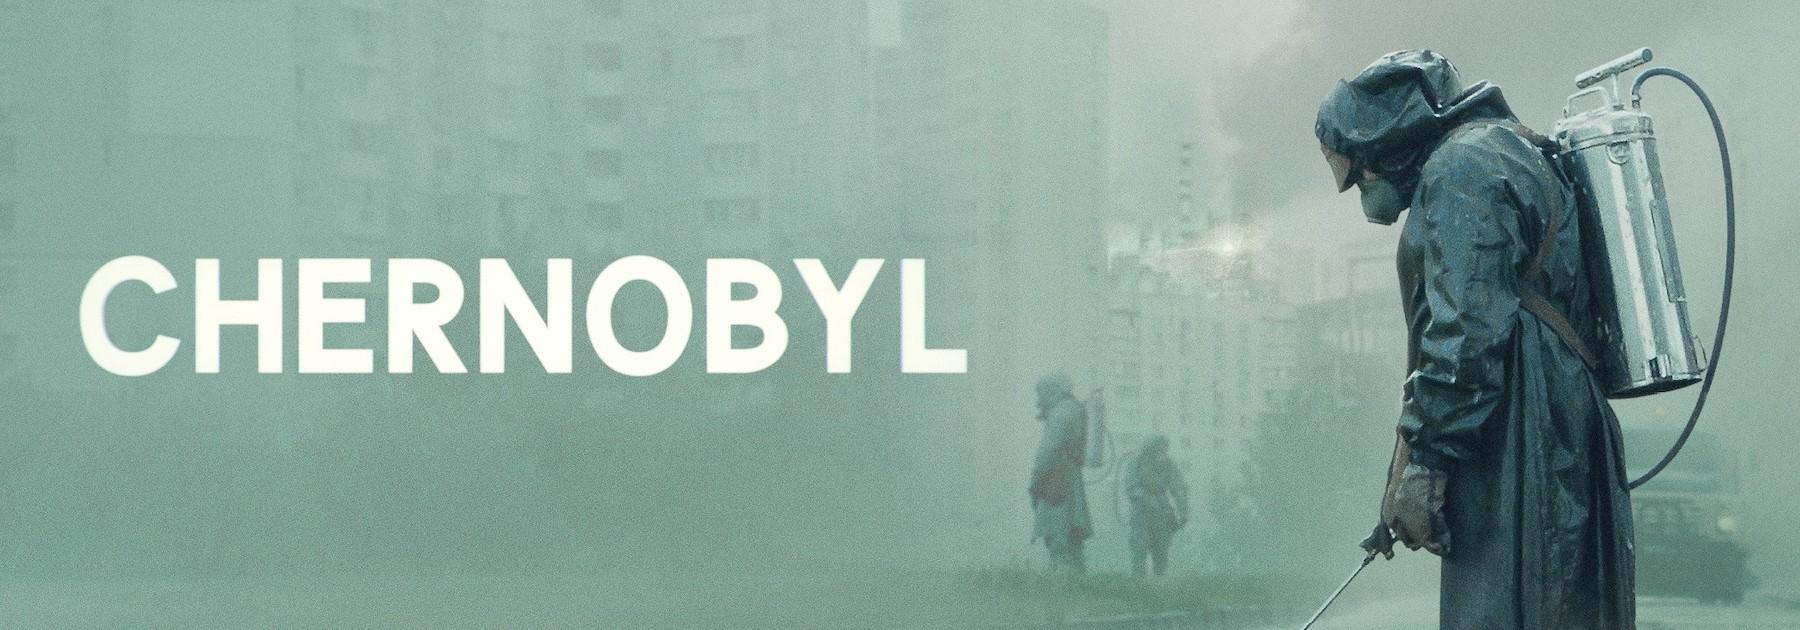 Chernobyl promotional image